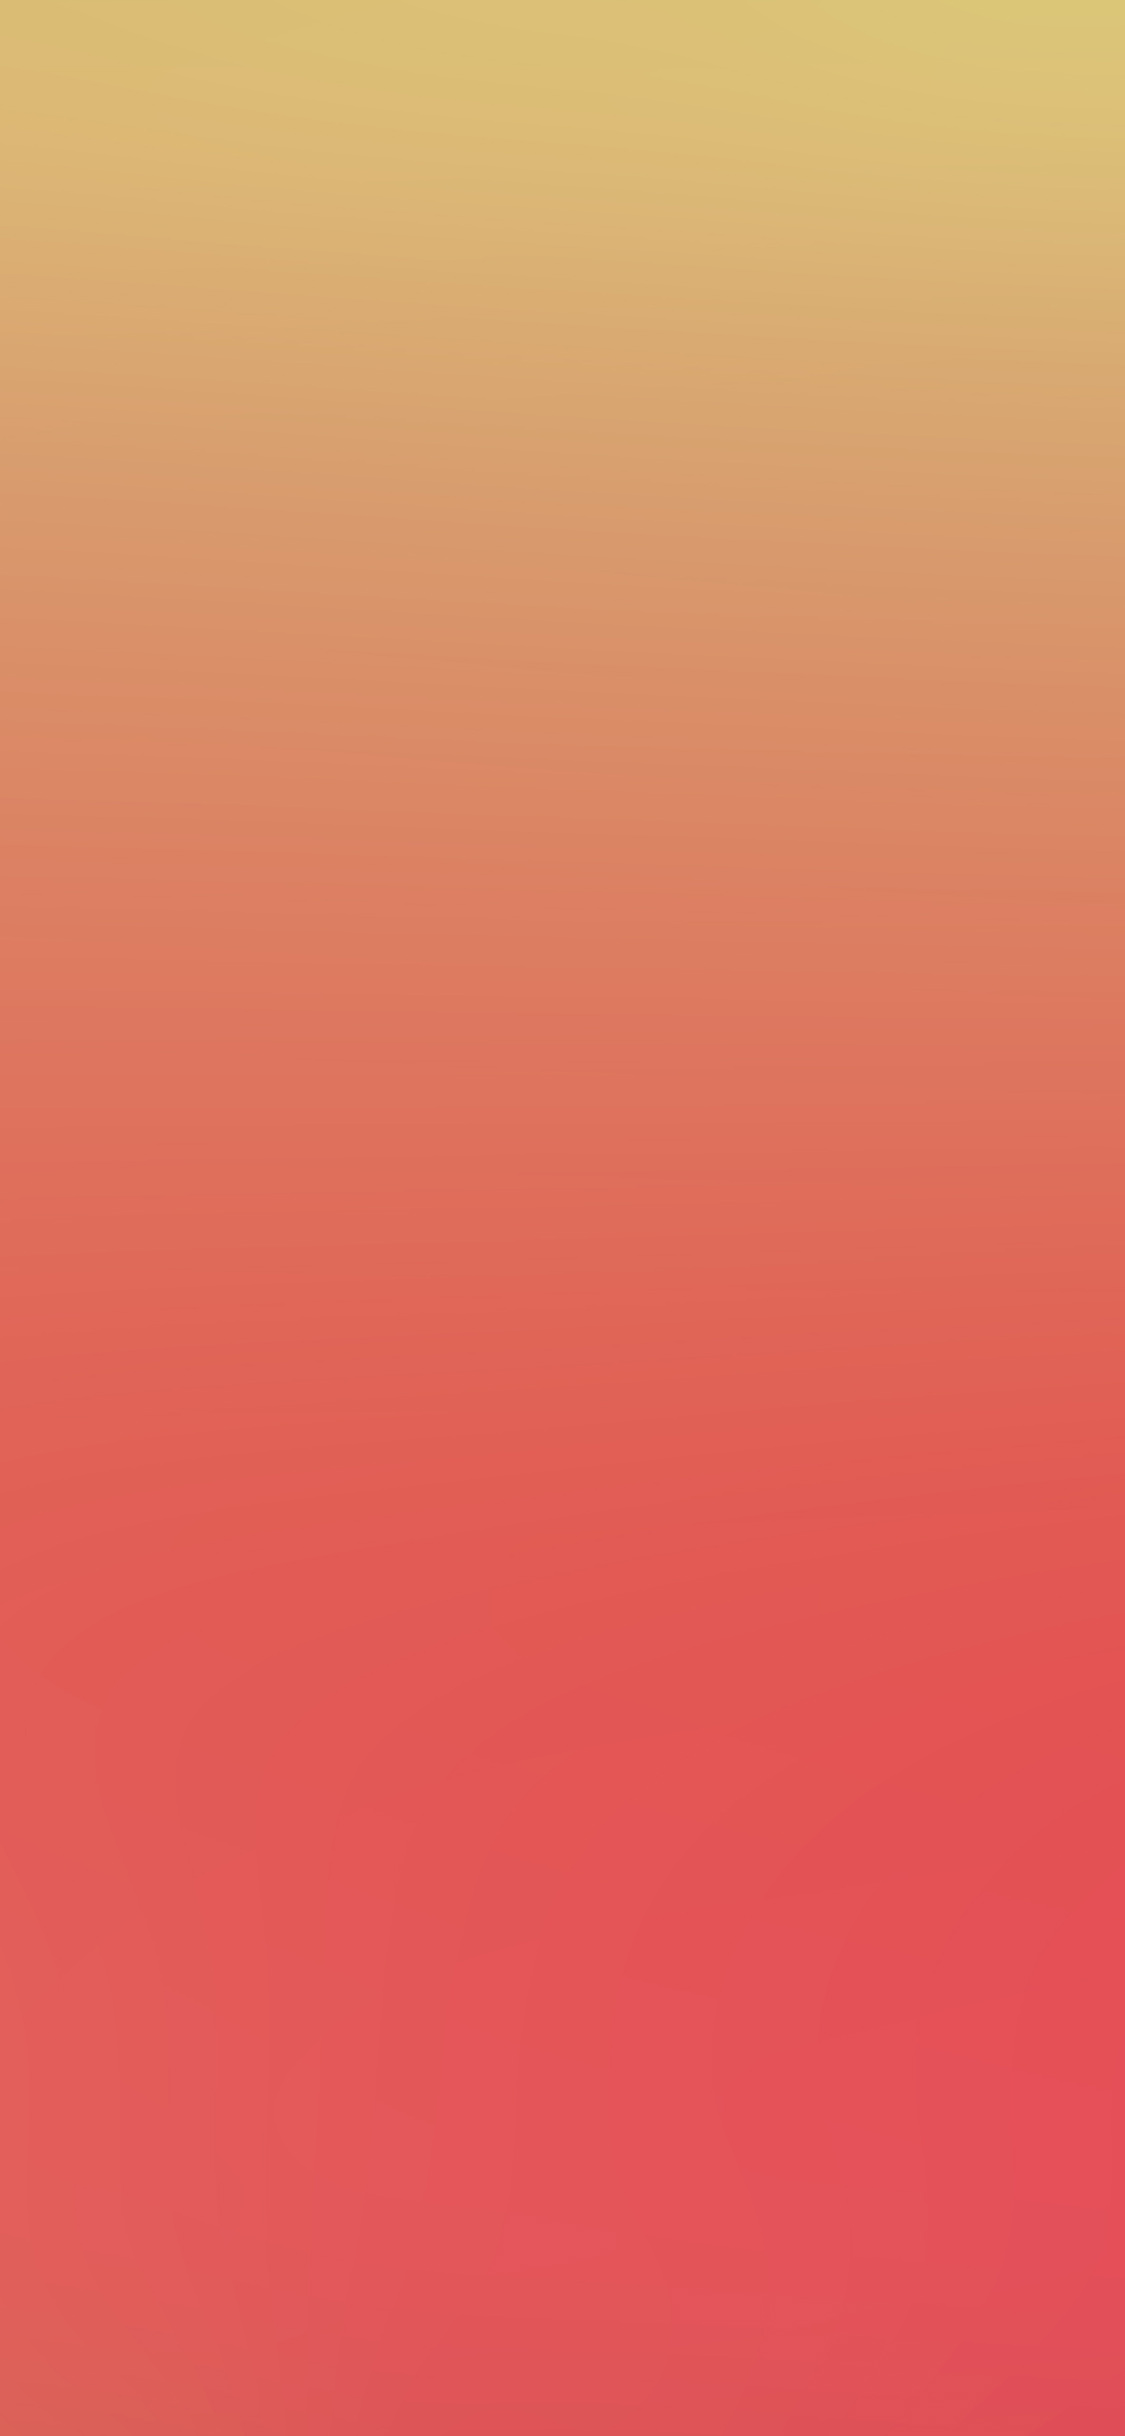 iPhoneXpapers.com-Apple-iPhone-wallpaper-si45-sun-red-orange-gradation-blur